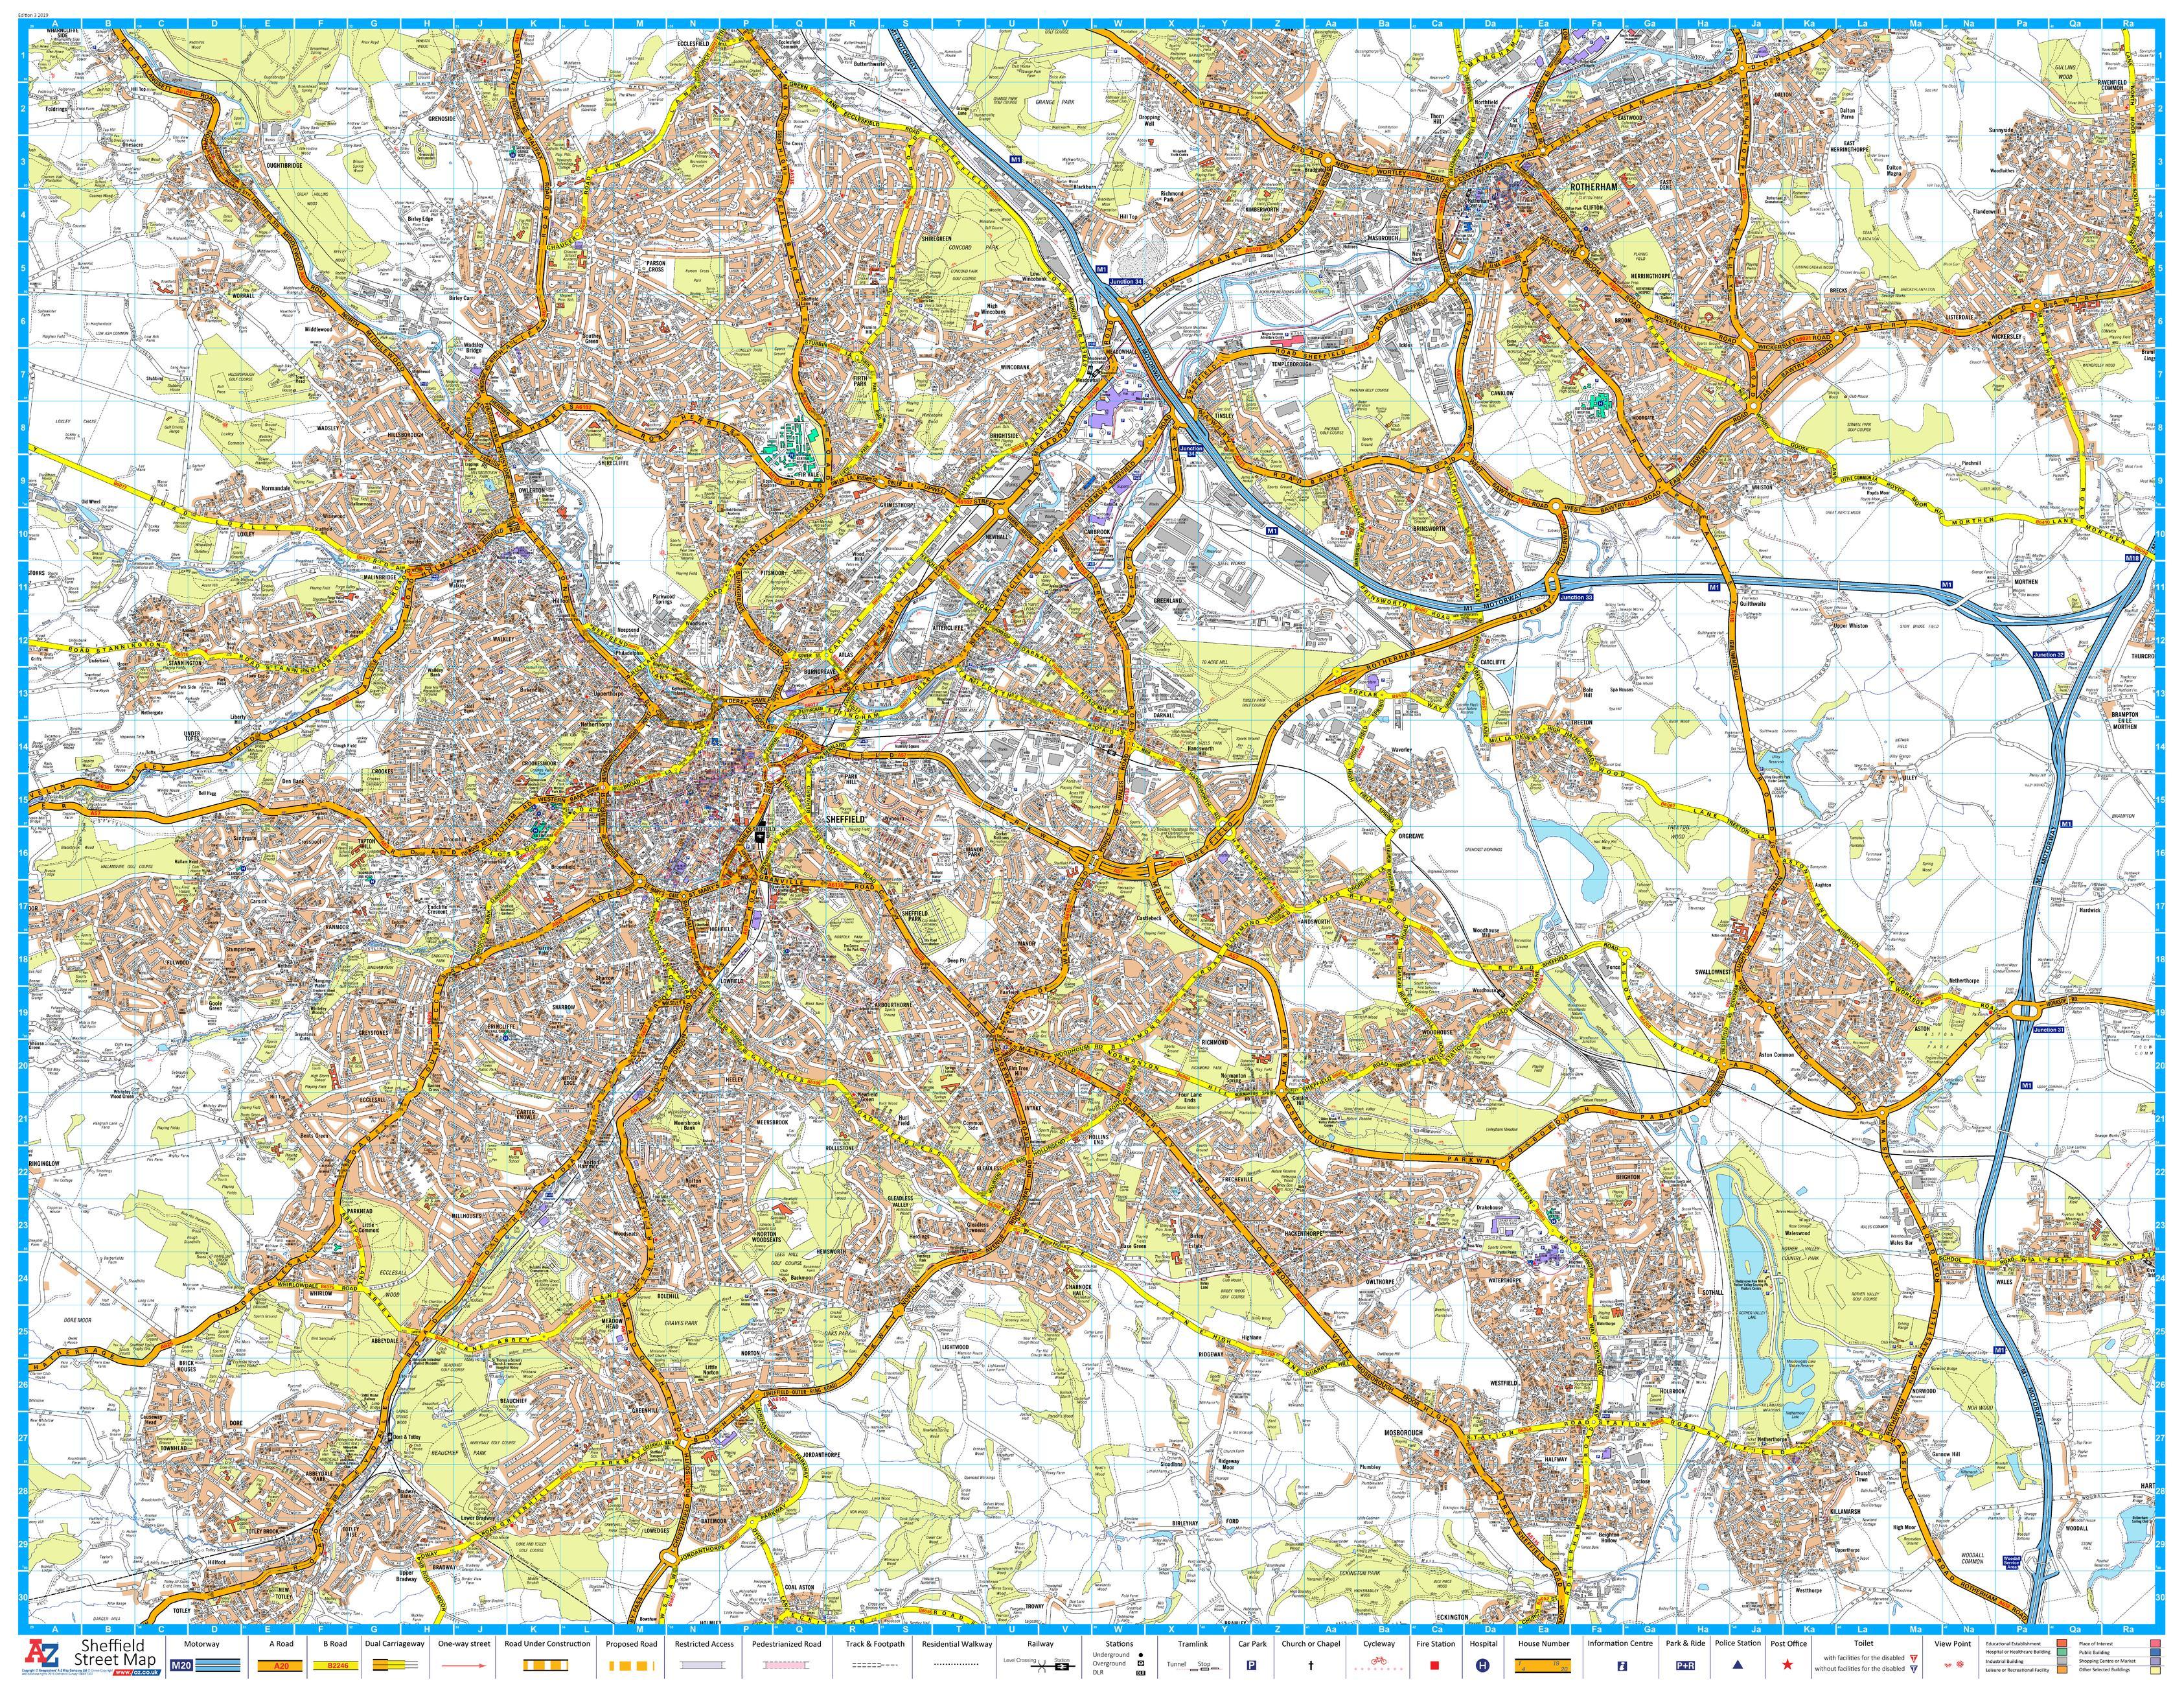 A-Z Sheffield Street Map